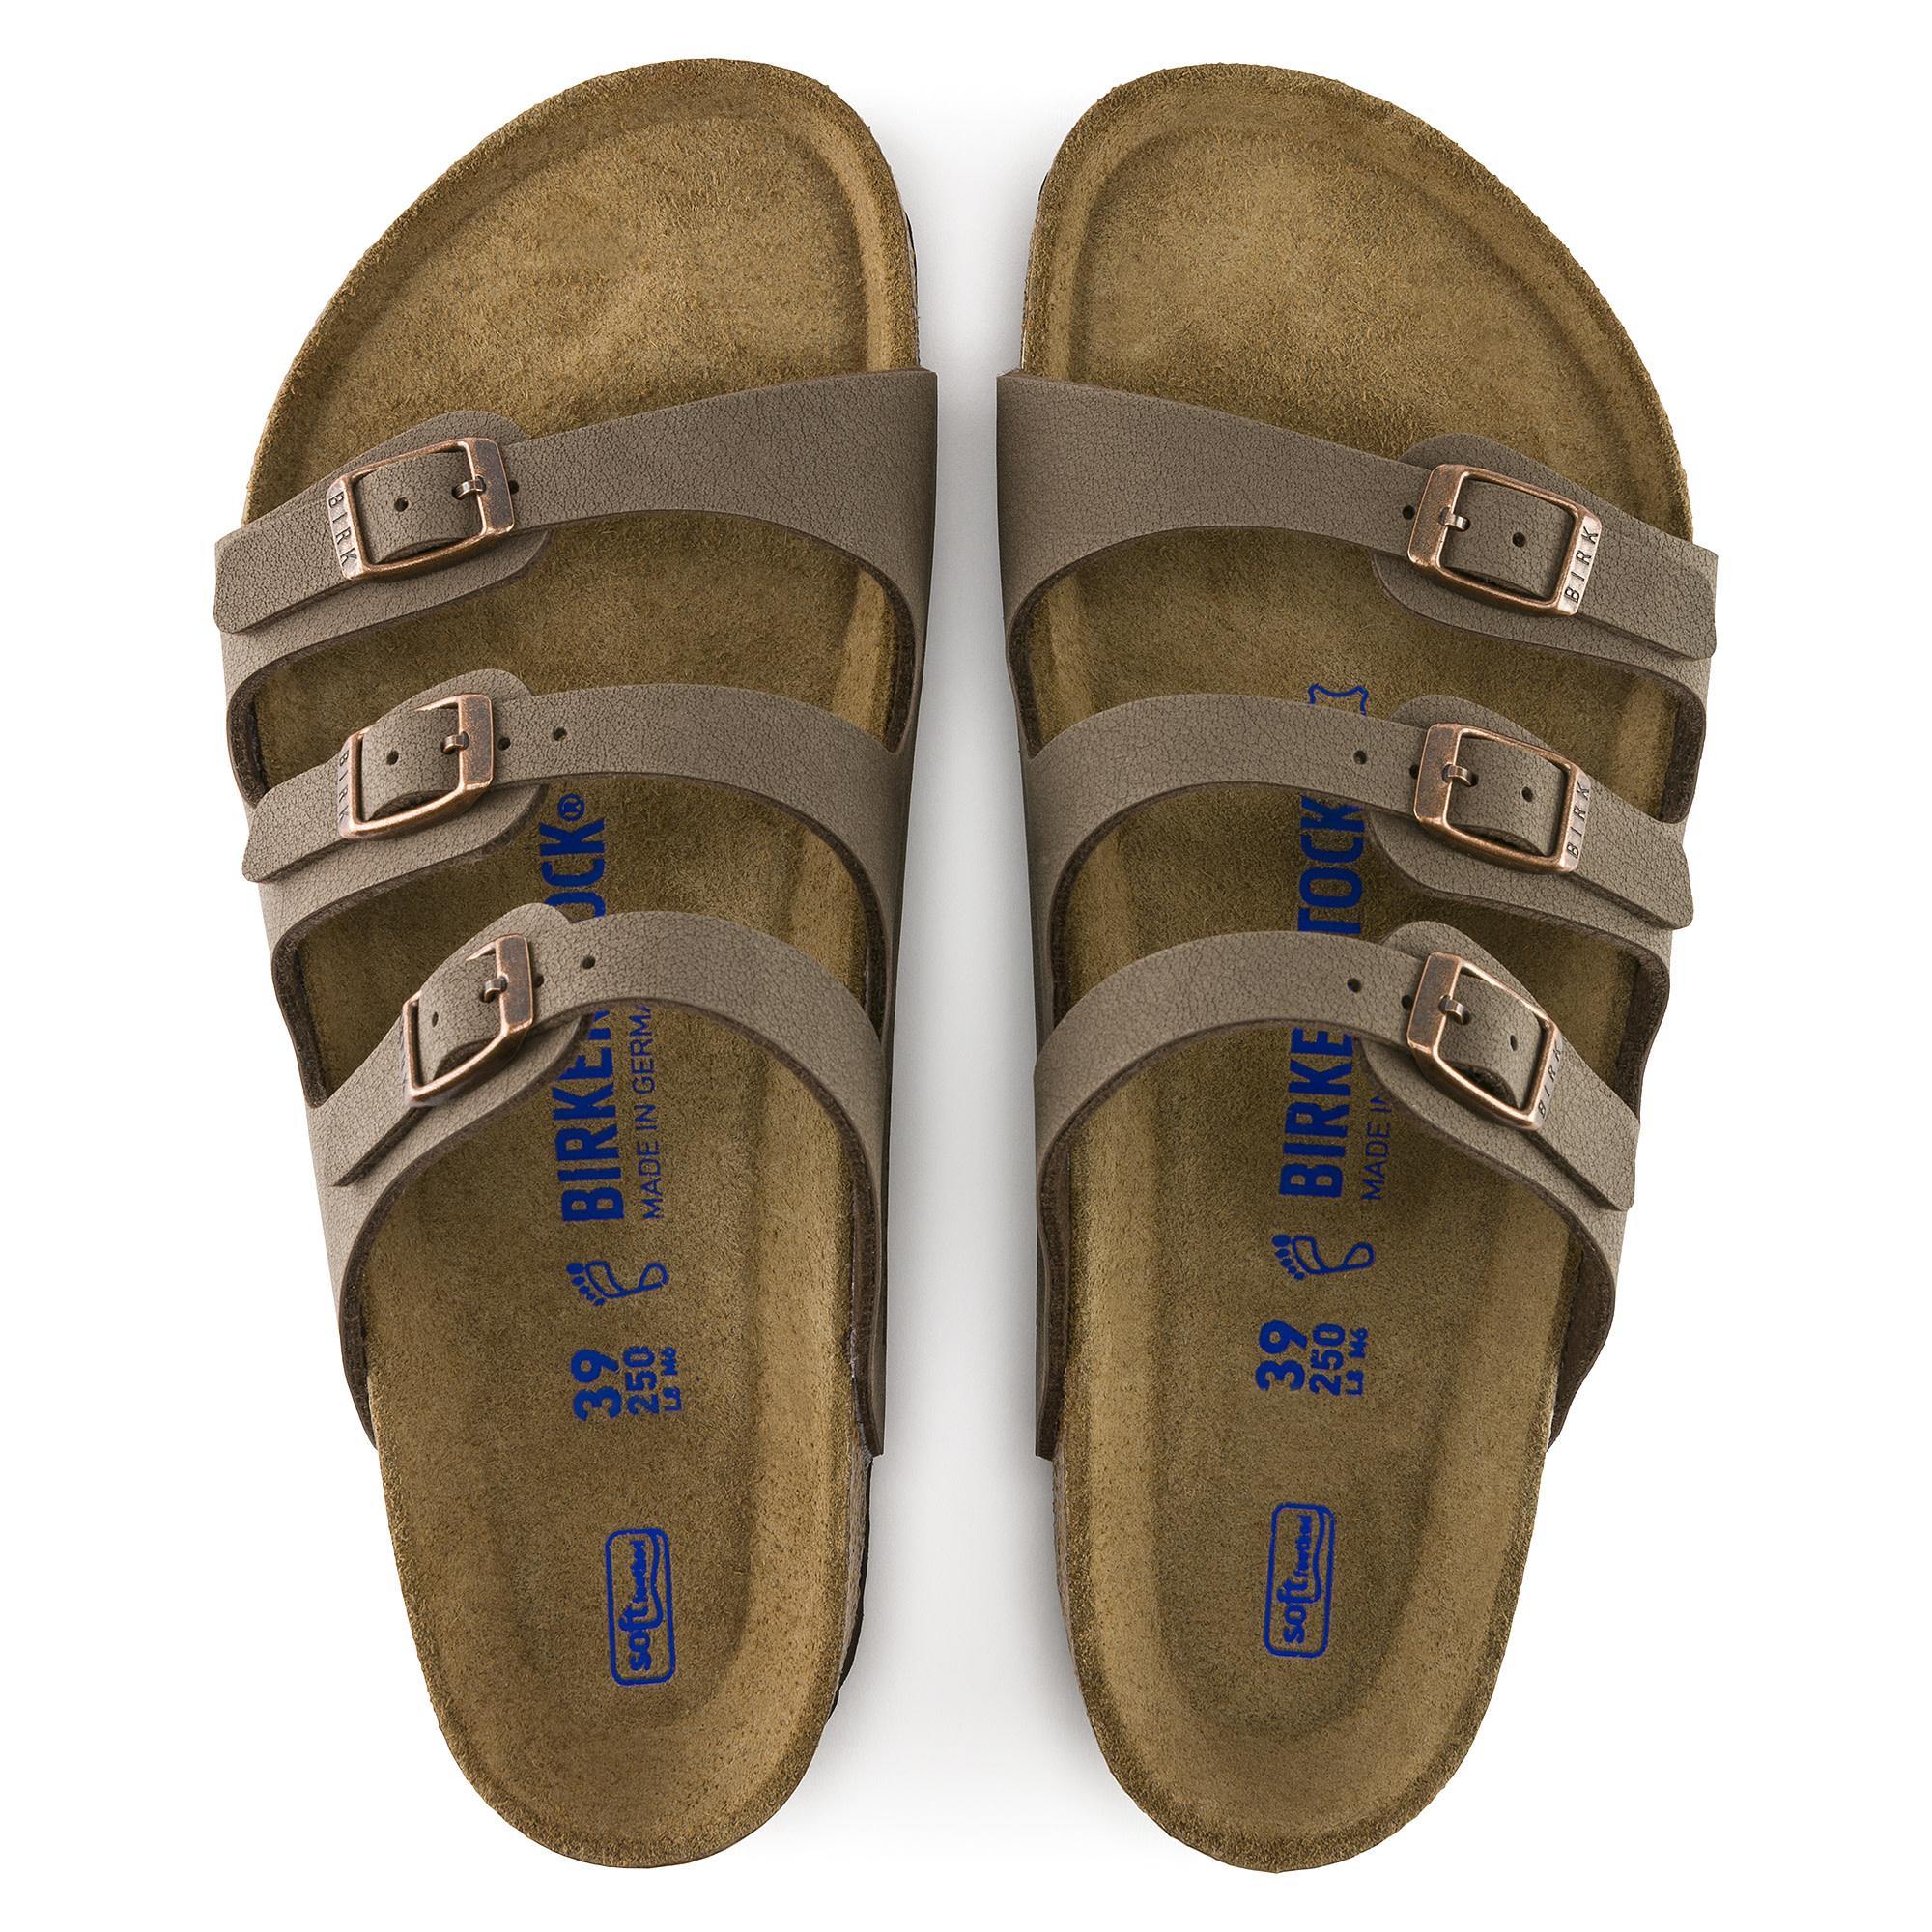 Birkenstock Birkenstock Florida Soft Footbed Birkibuc (Women - Regular) - Mocha